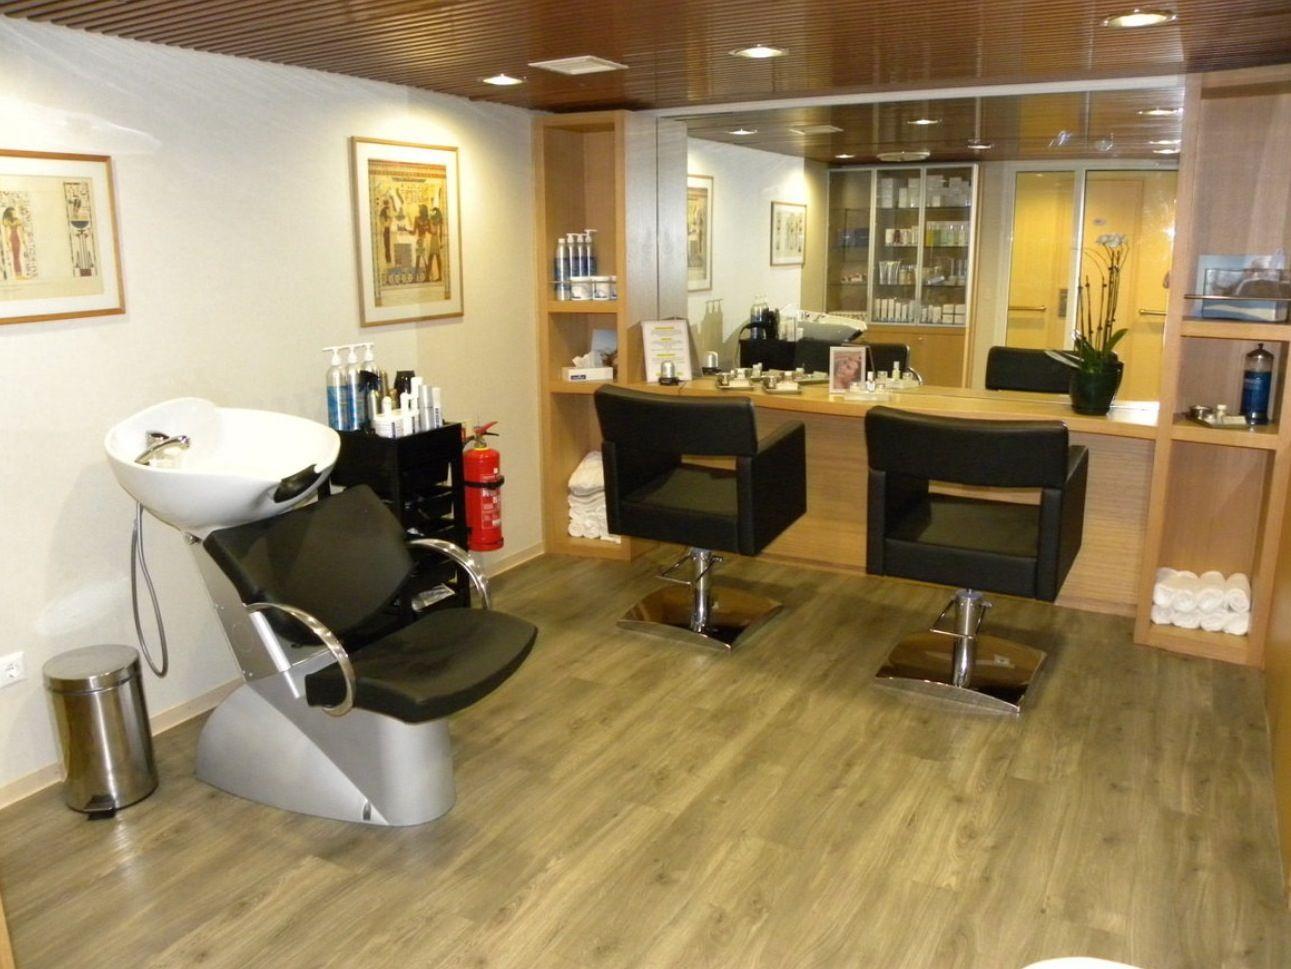 Hair Salon Salon Interior Design Small Hair Salon Home Beauty